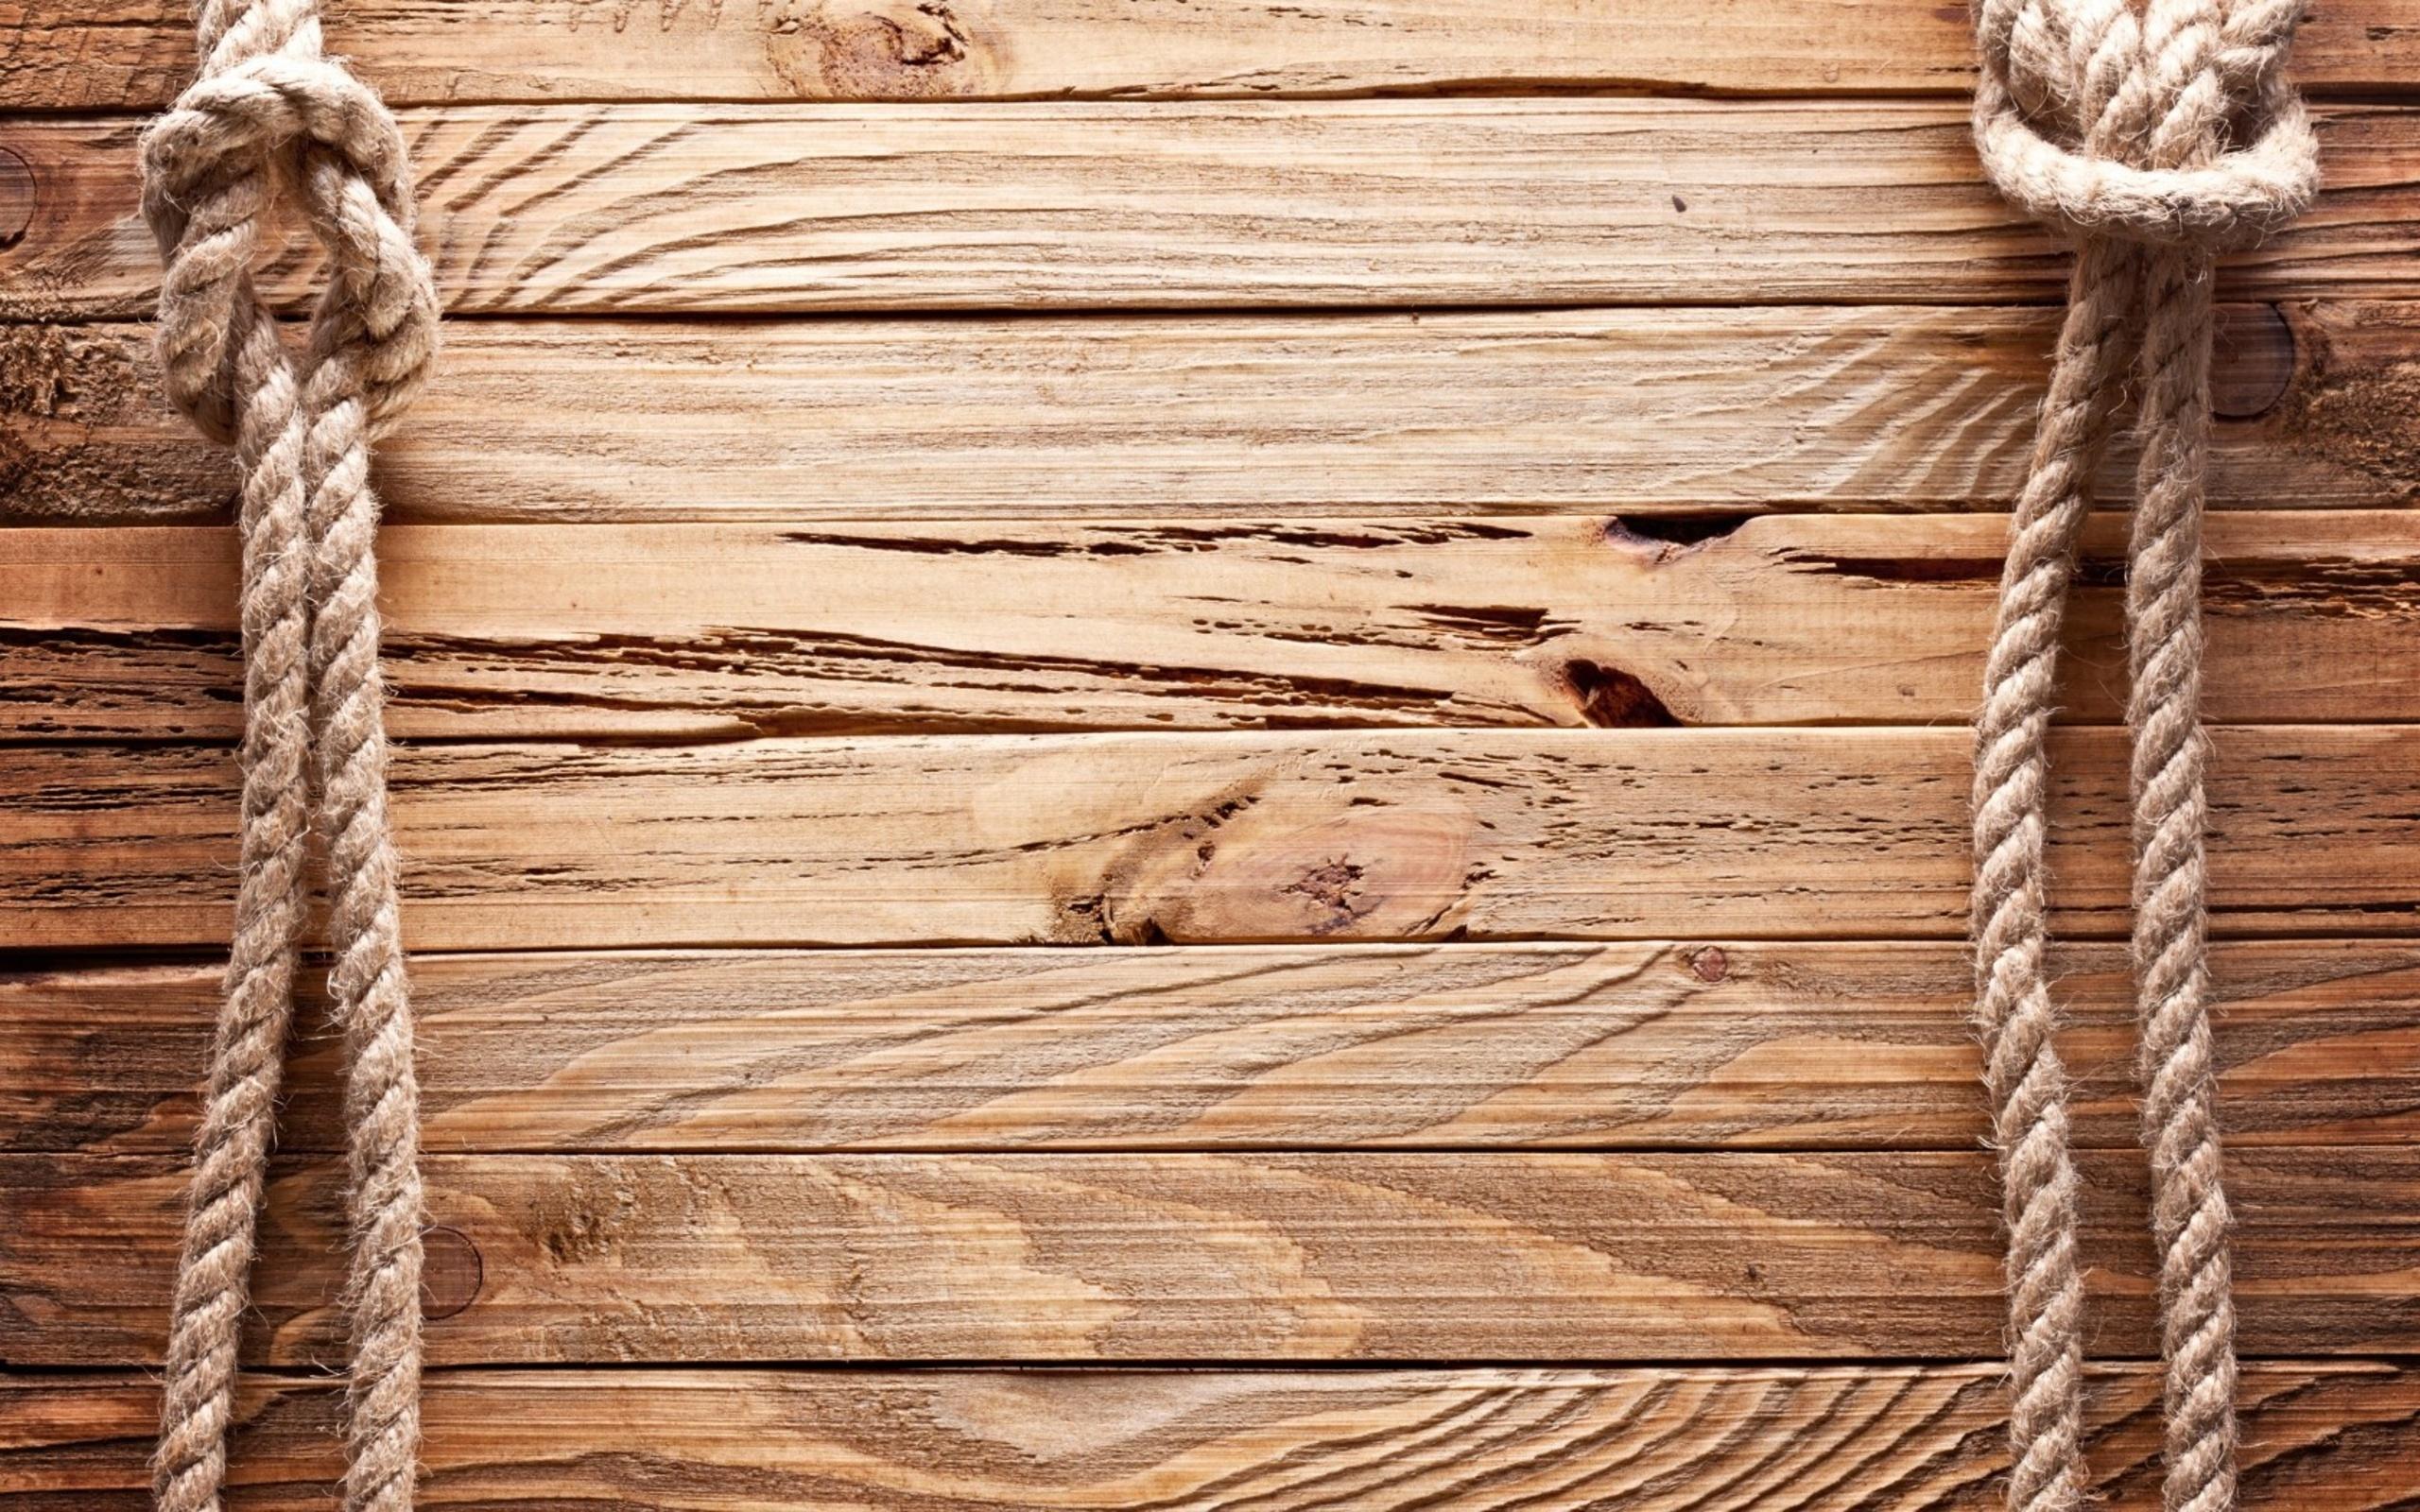 wood design wallpaper photo - 3